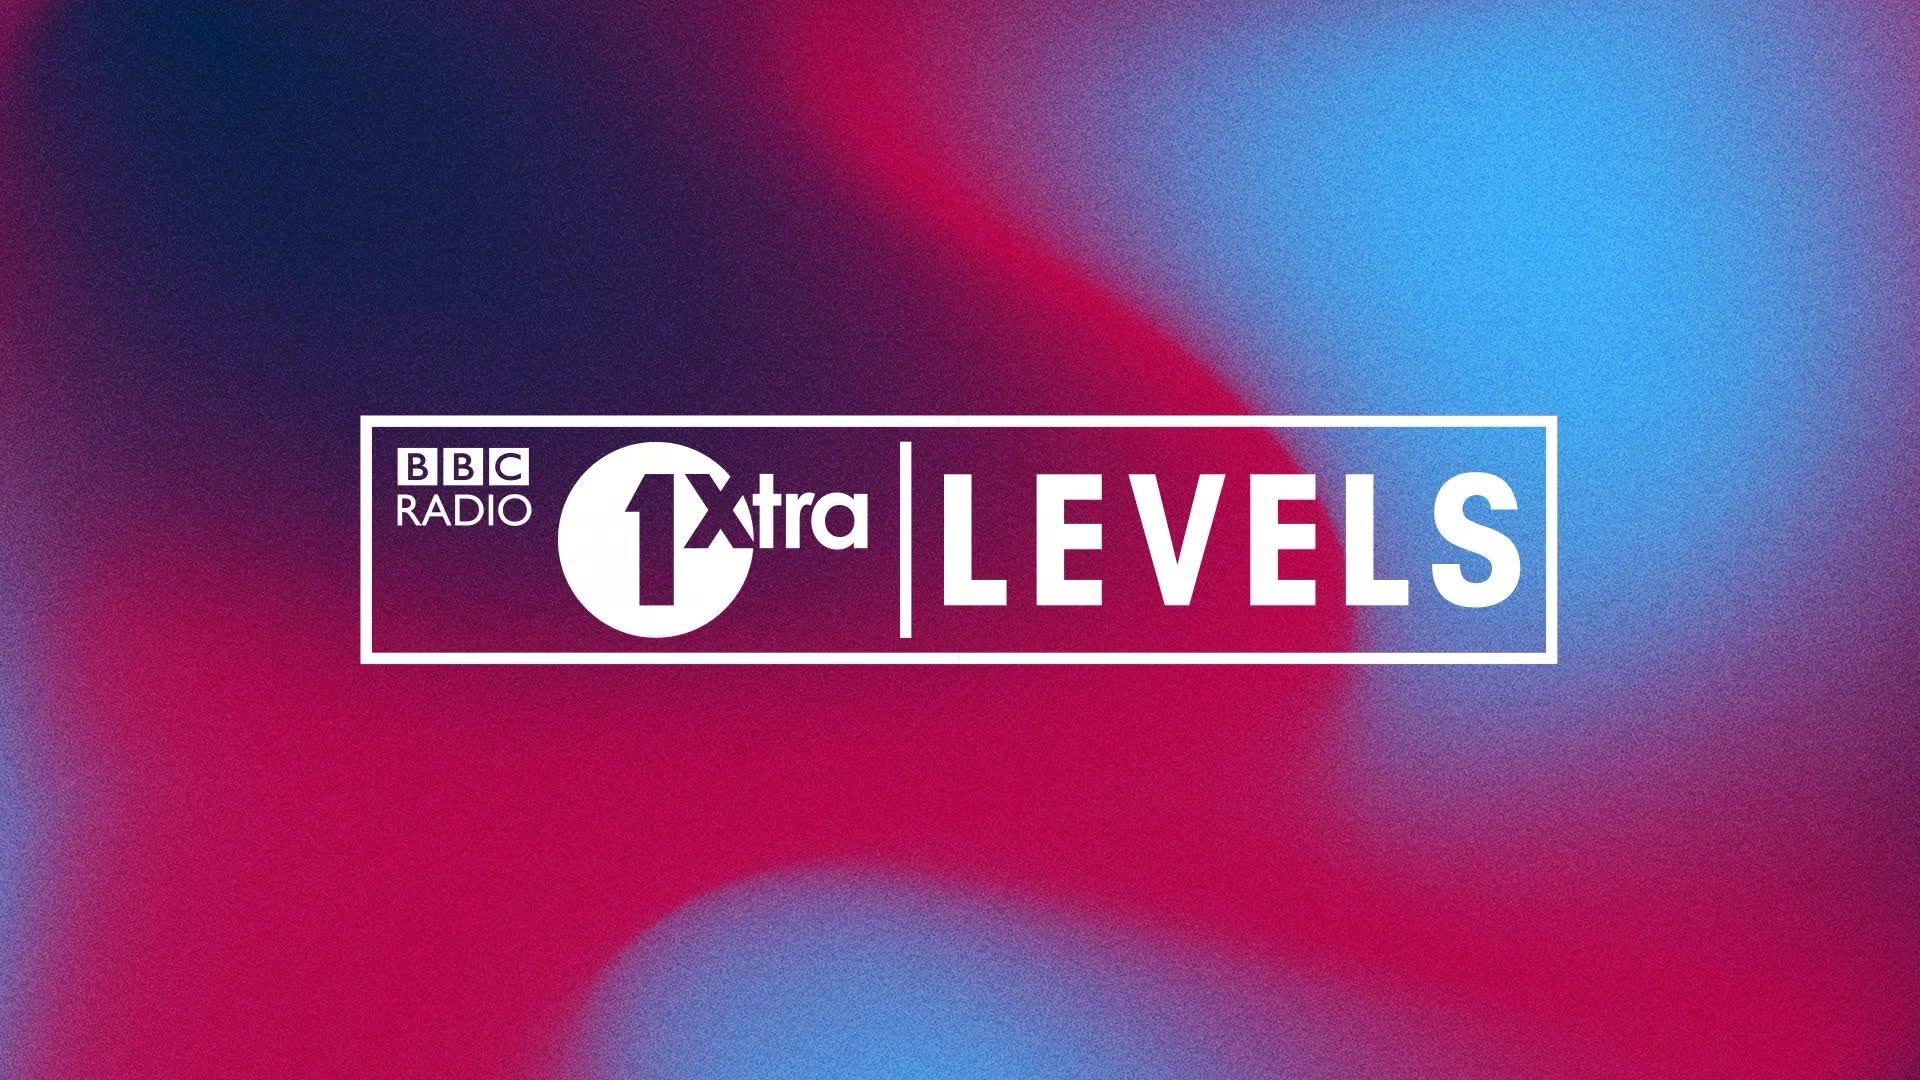 BBC Radio 1Xtra Levels Manchester